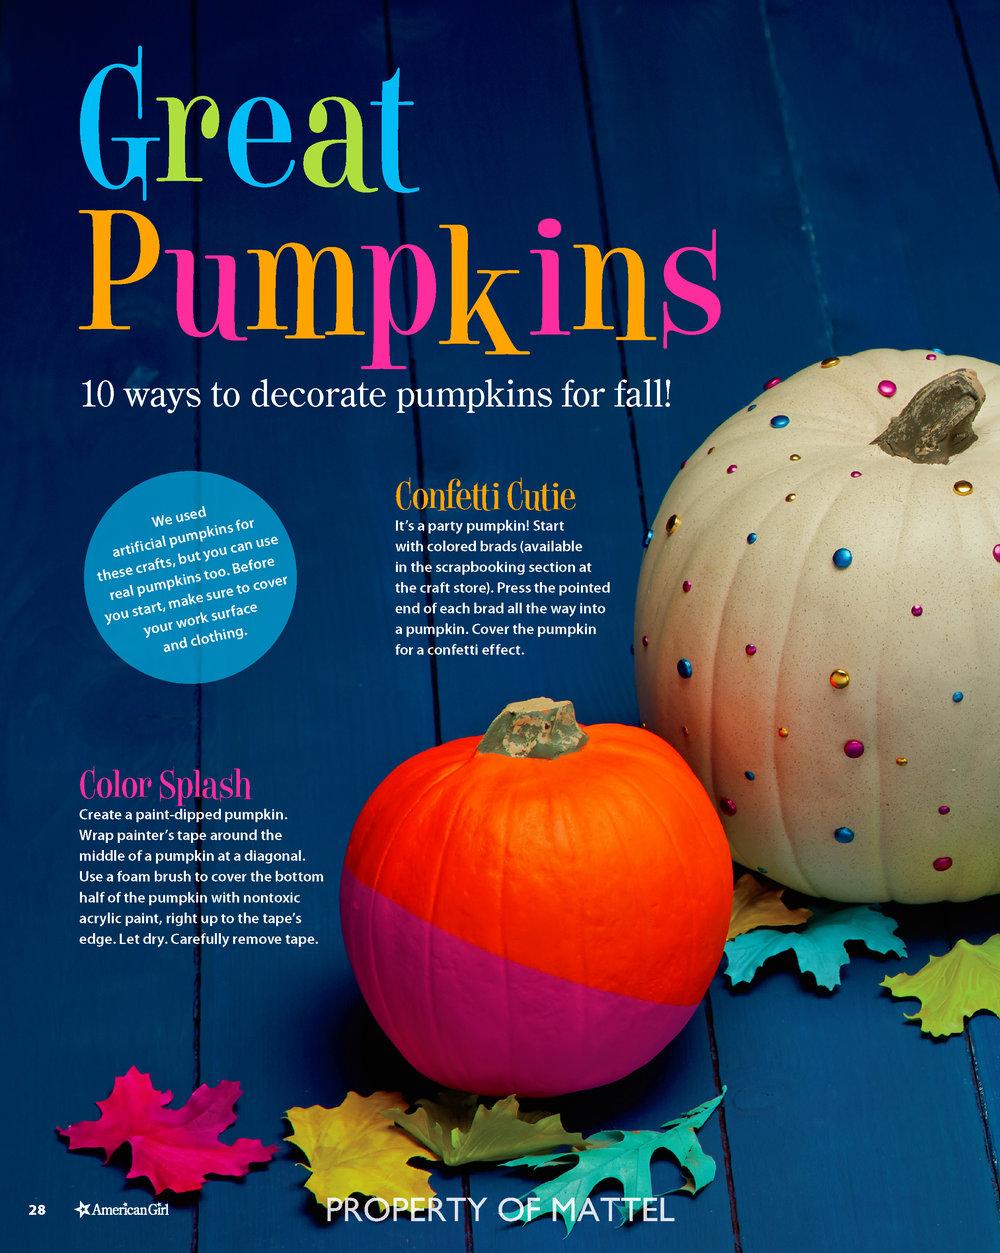 GreatPumpkinsFeature_Page_1.jpg